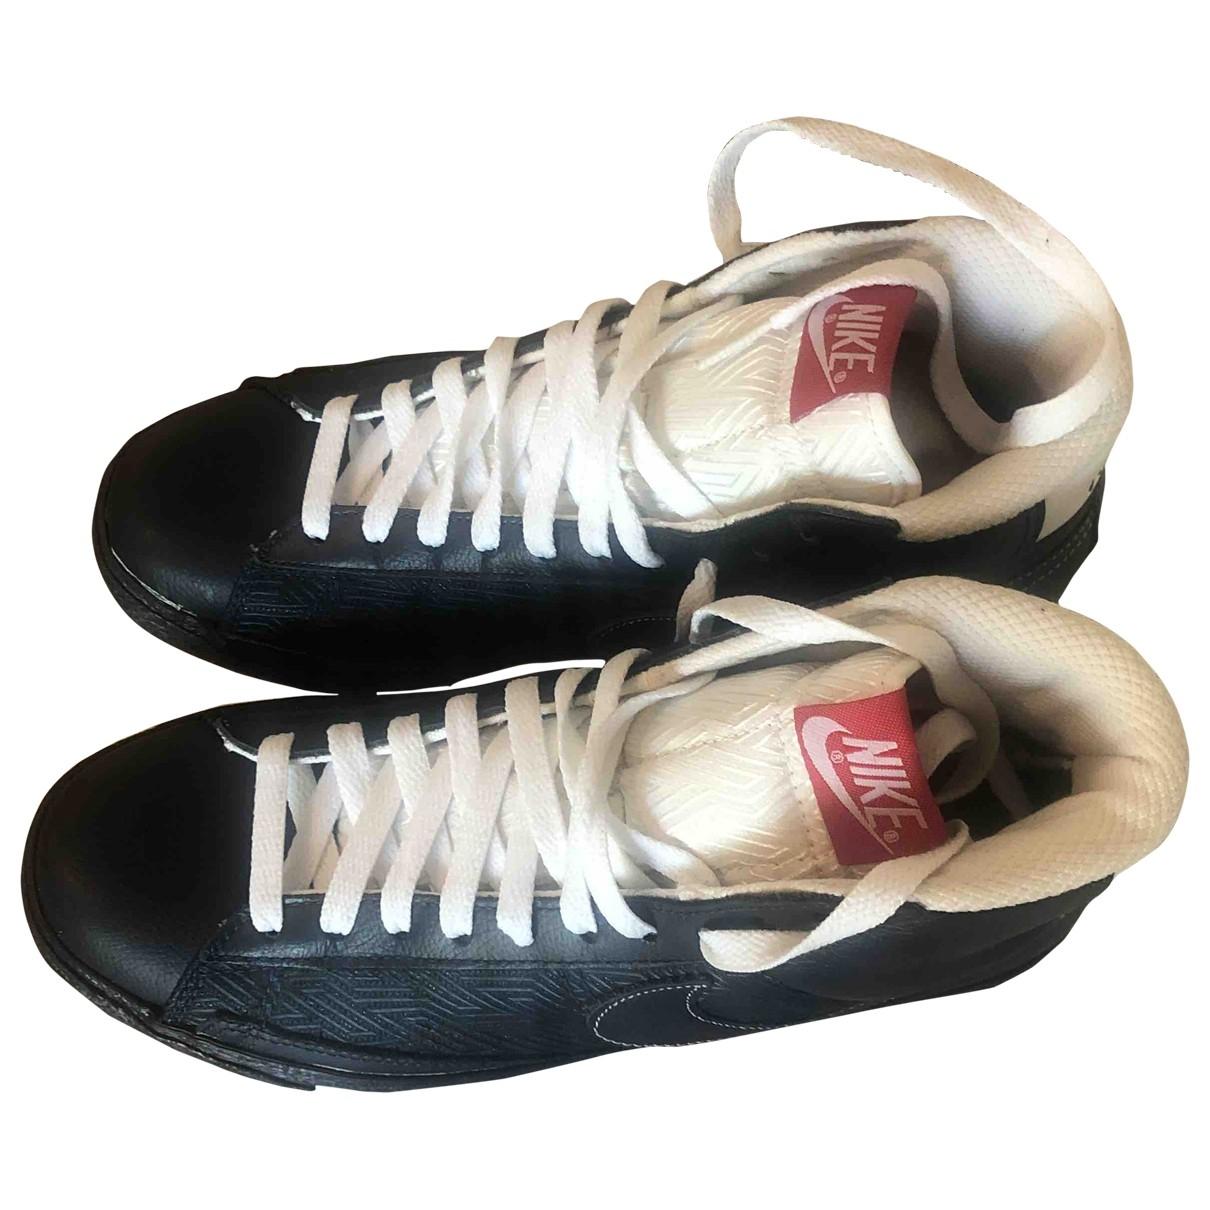 Nike Blazer Black Leather Trainers for Men 41 EU